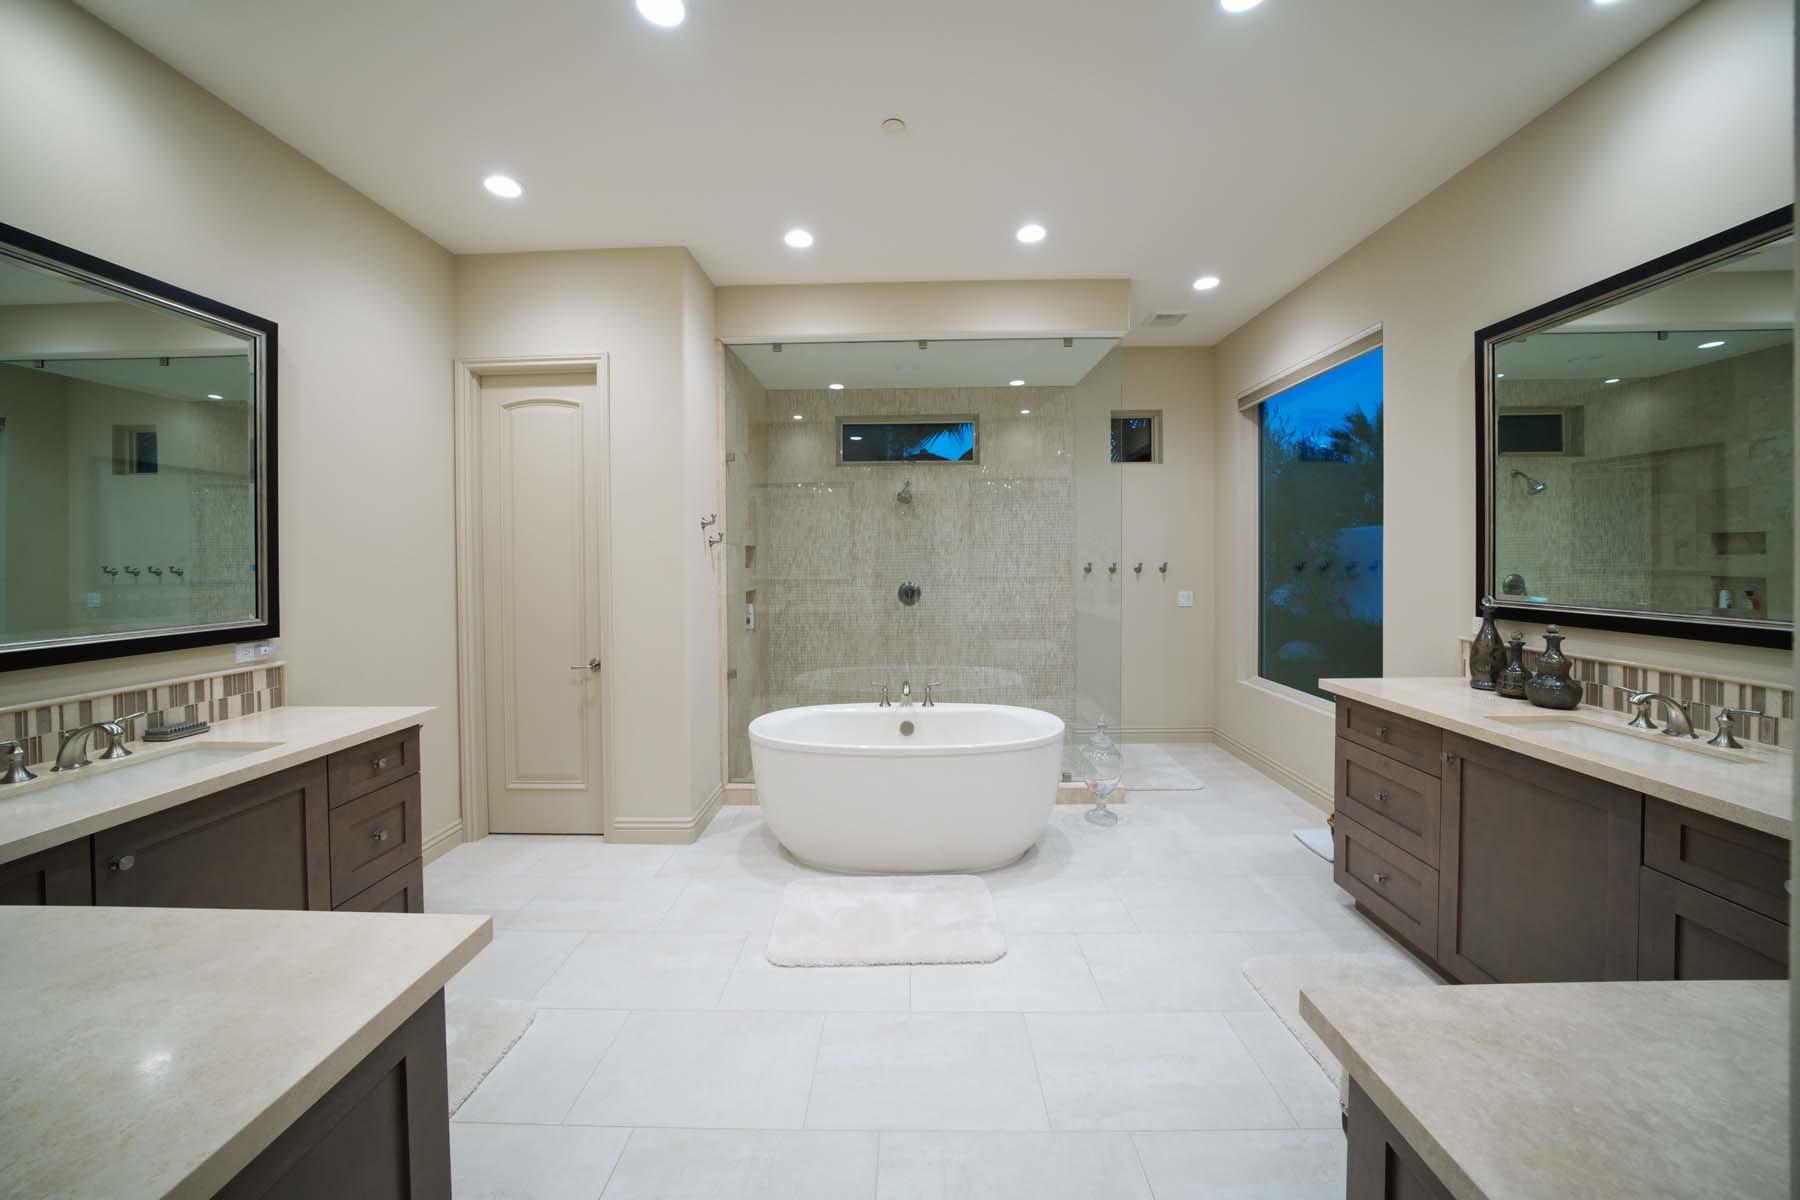 toscanabathroom